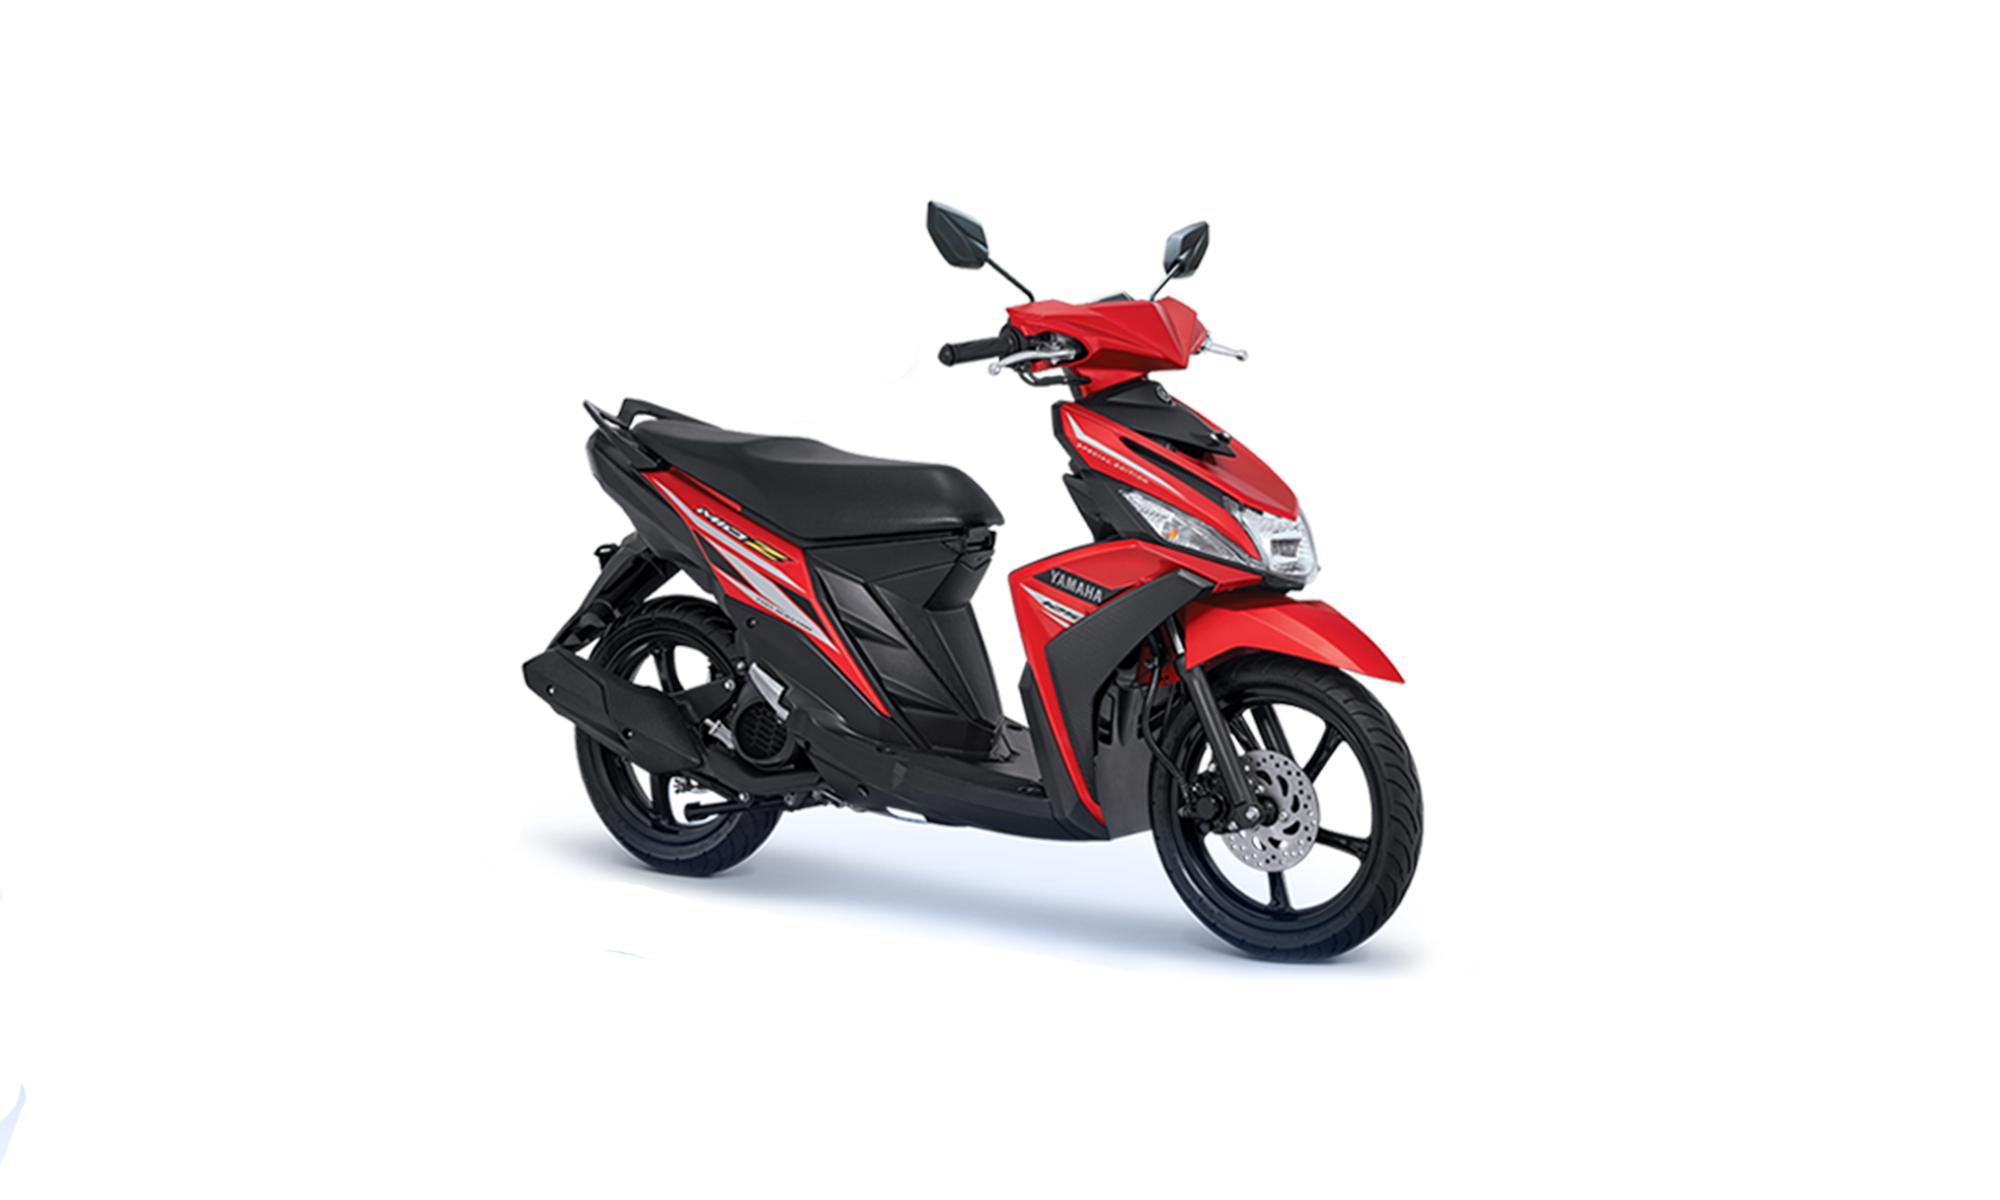 Yamaha mio z png 6 » PNG Image.